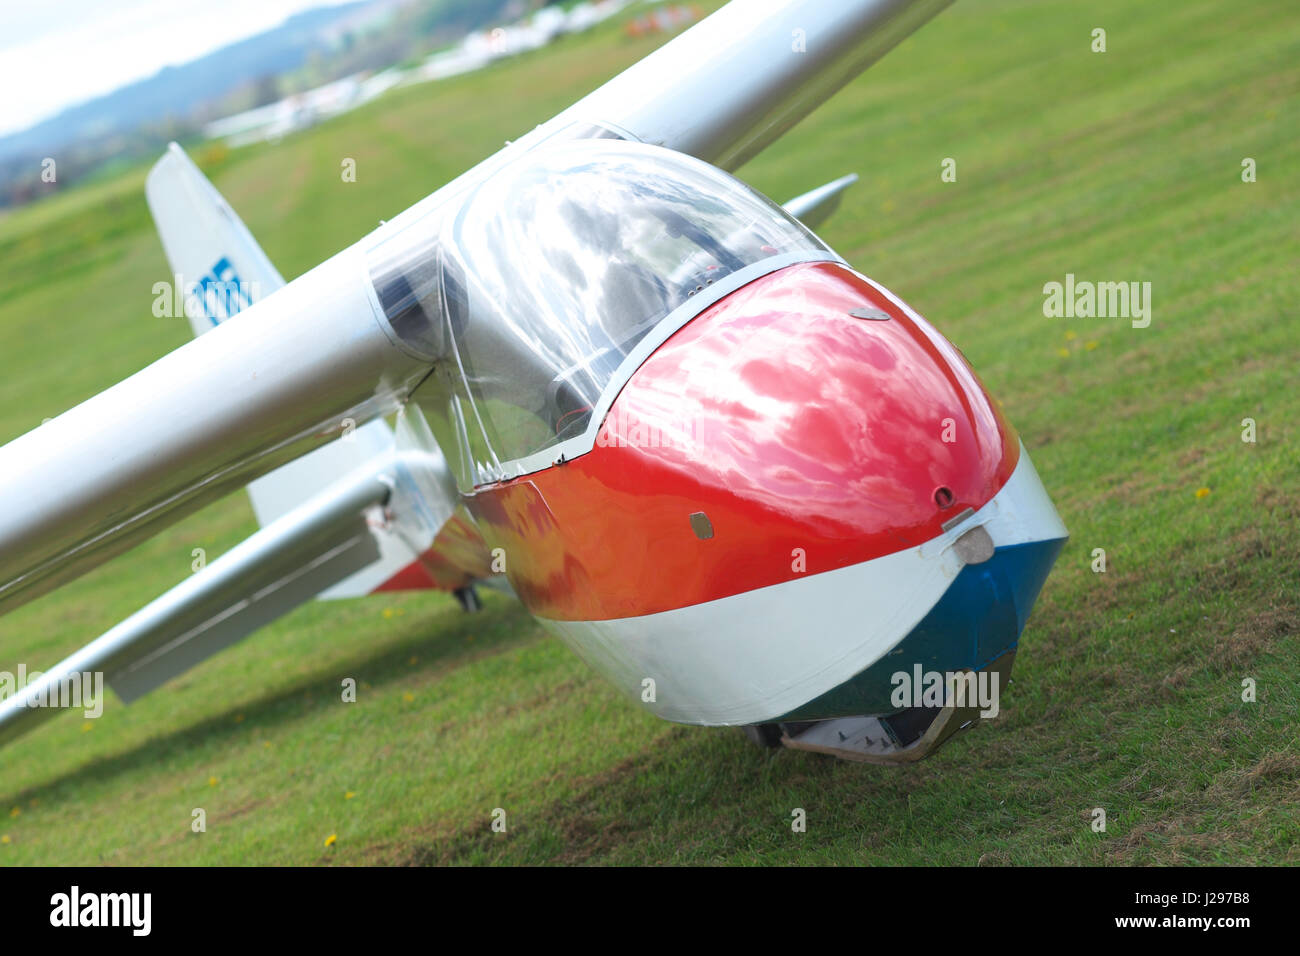 Gliding club Schleicher K7 two seater training glider - Stock Image